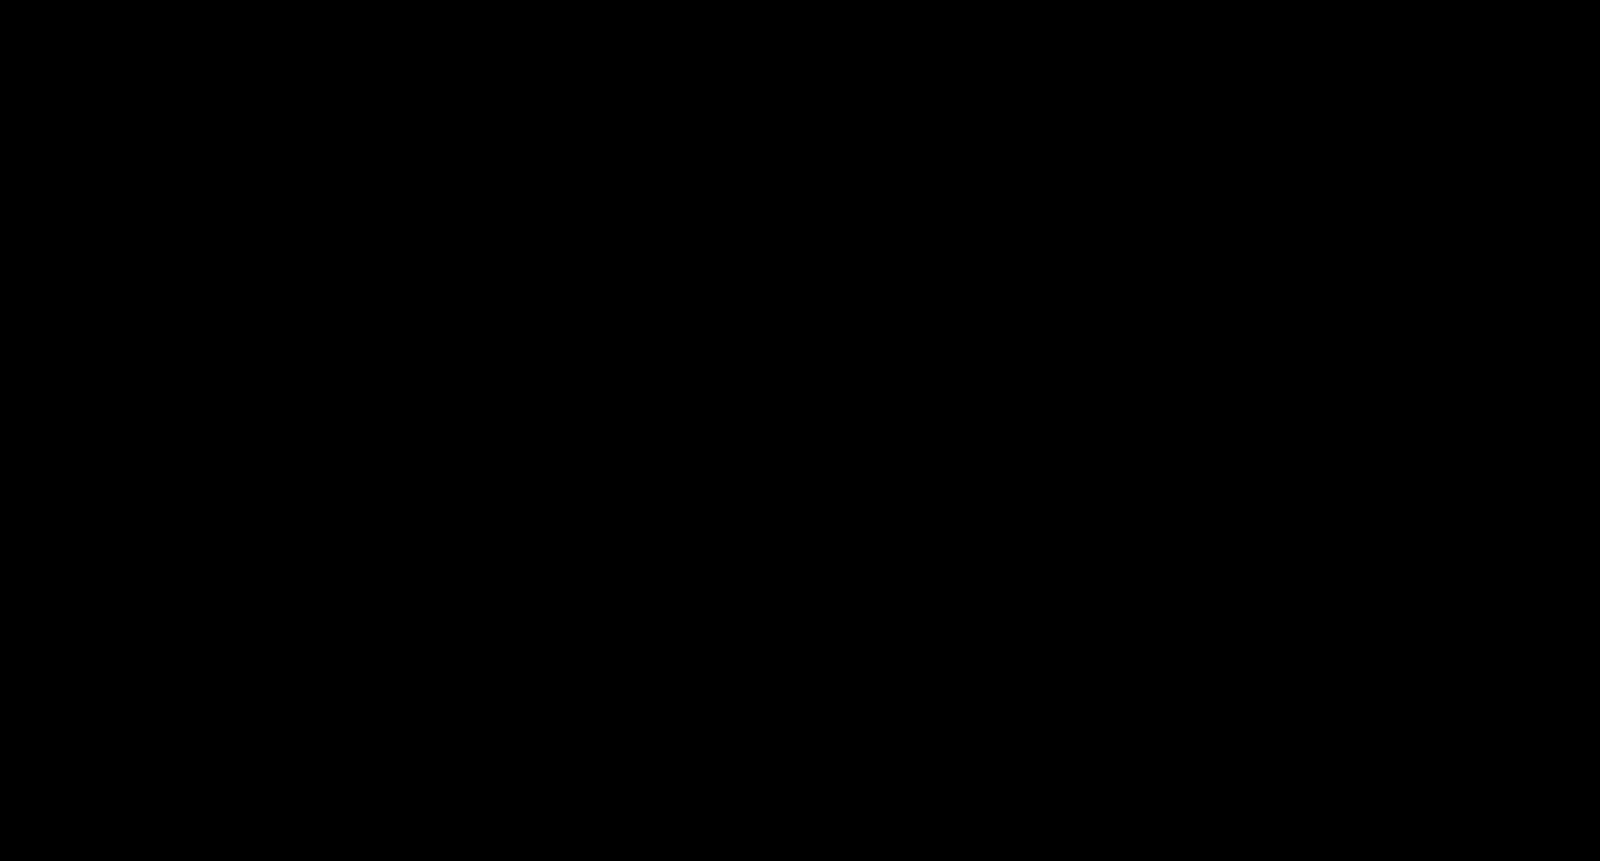 Clipart nike logo.